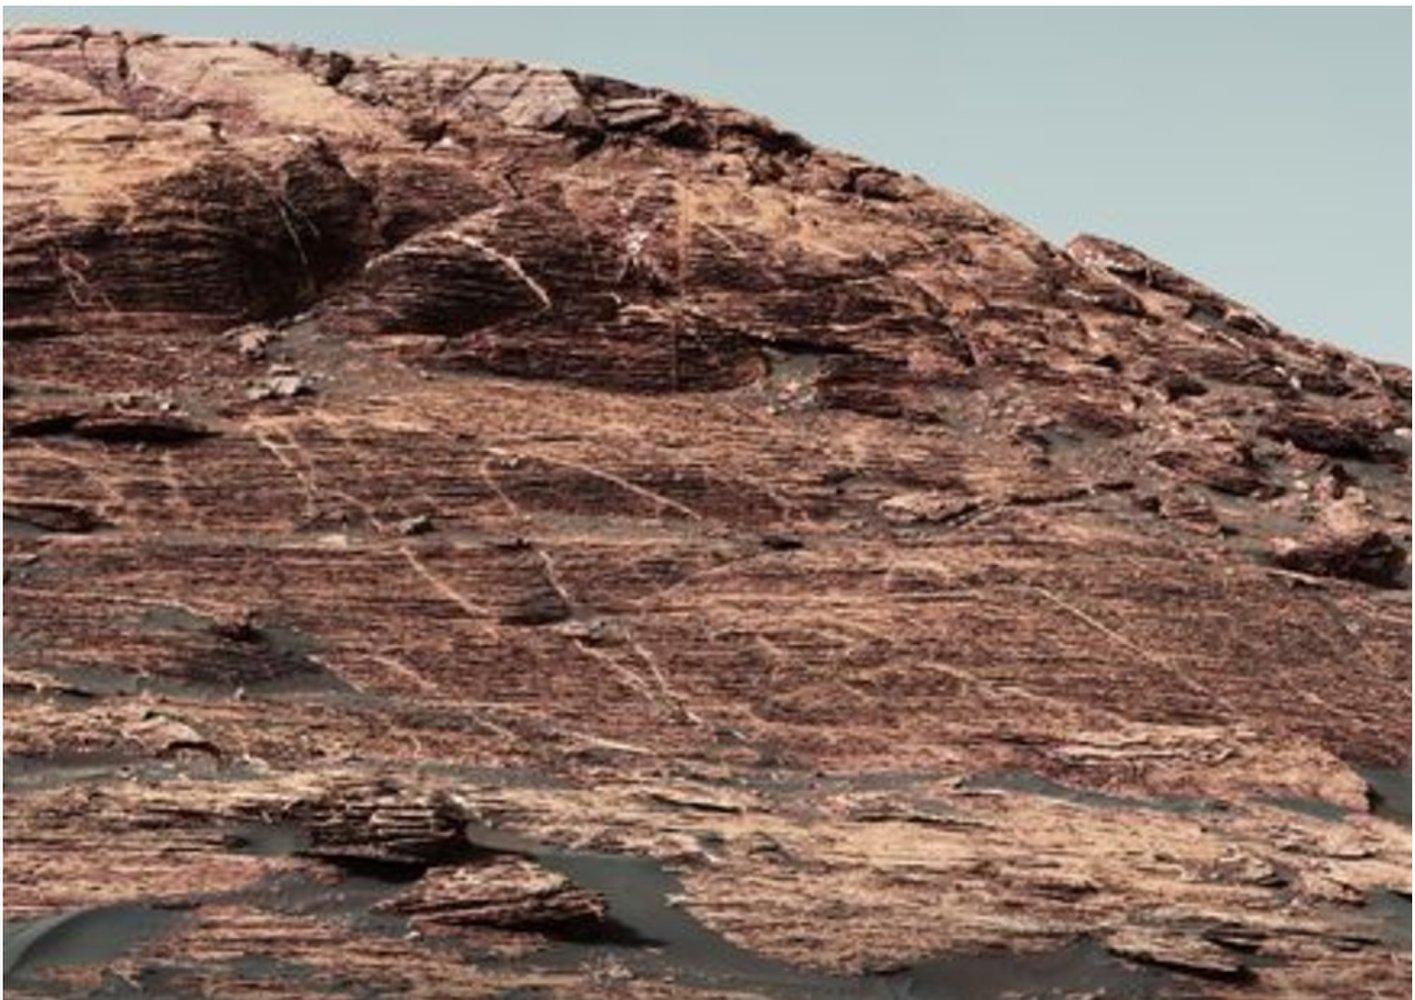 Curiosity Rover Climbing Steep Martian Ridge (Photos) https://t.co/nxpDjUg68R https://t.co/jrQJDxGDRU